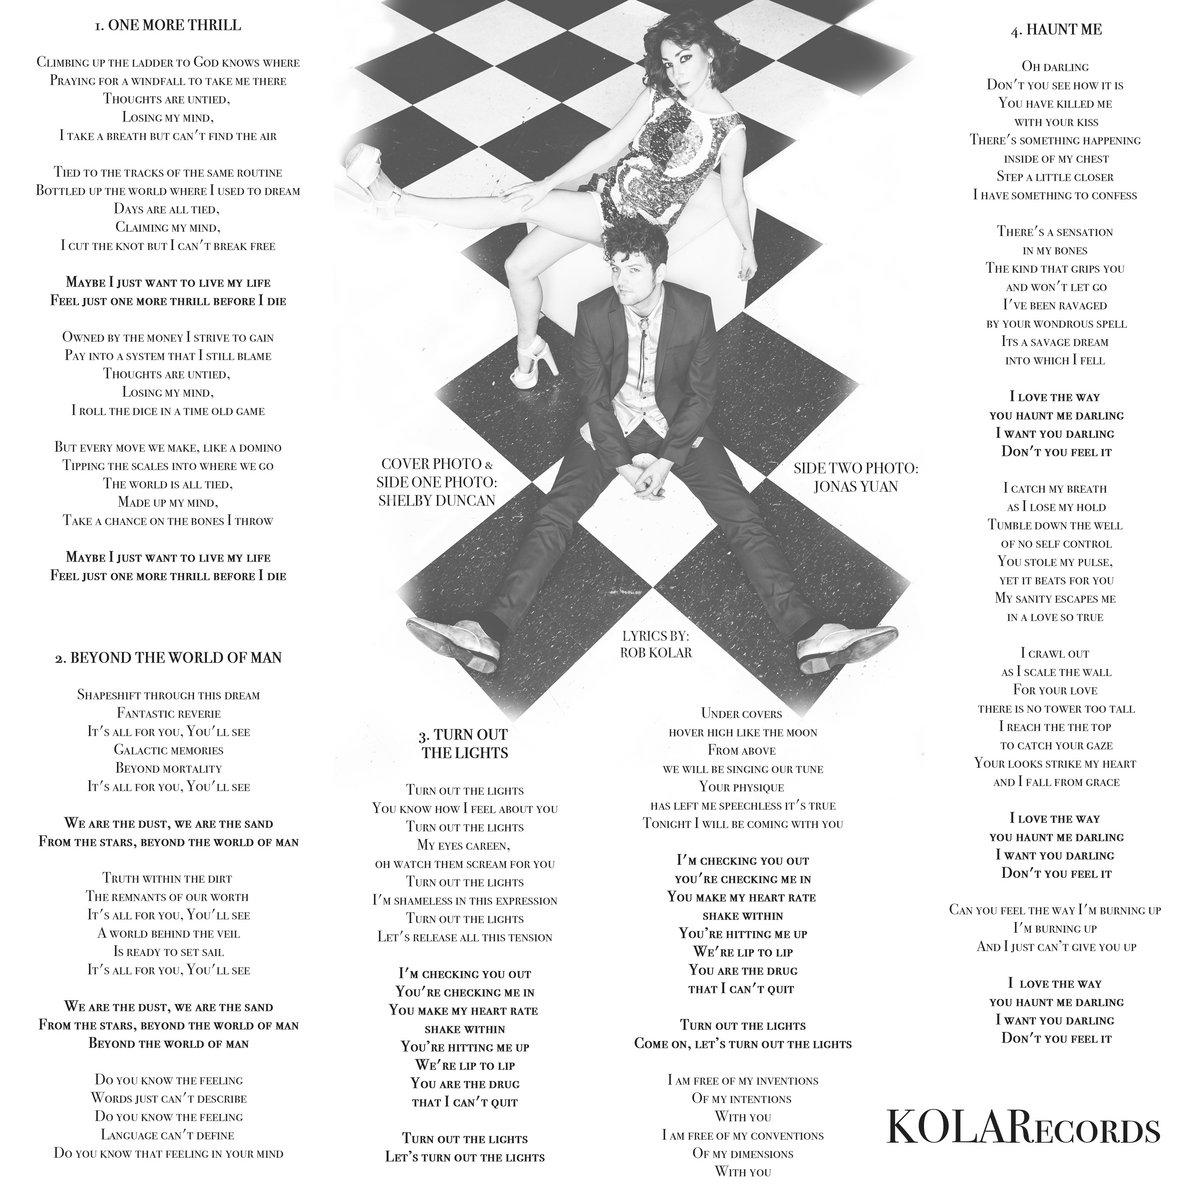 KOLARS | KOLARS